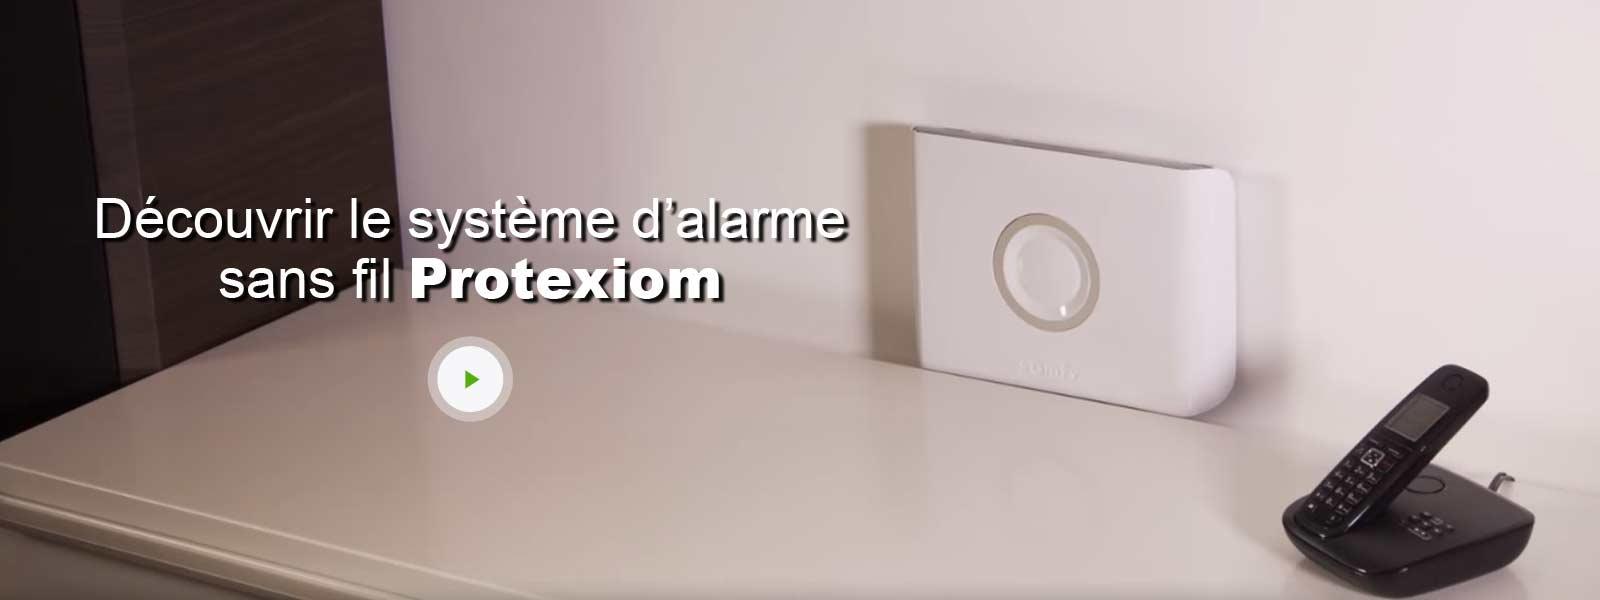 alarme maison sans fil compatible animaux somfy protexiom optimum gsm leroy merlin. Black Bedroom Furniture Sets. Home Design Ideas